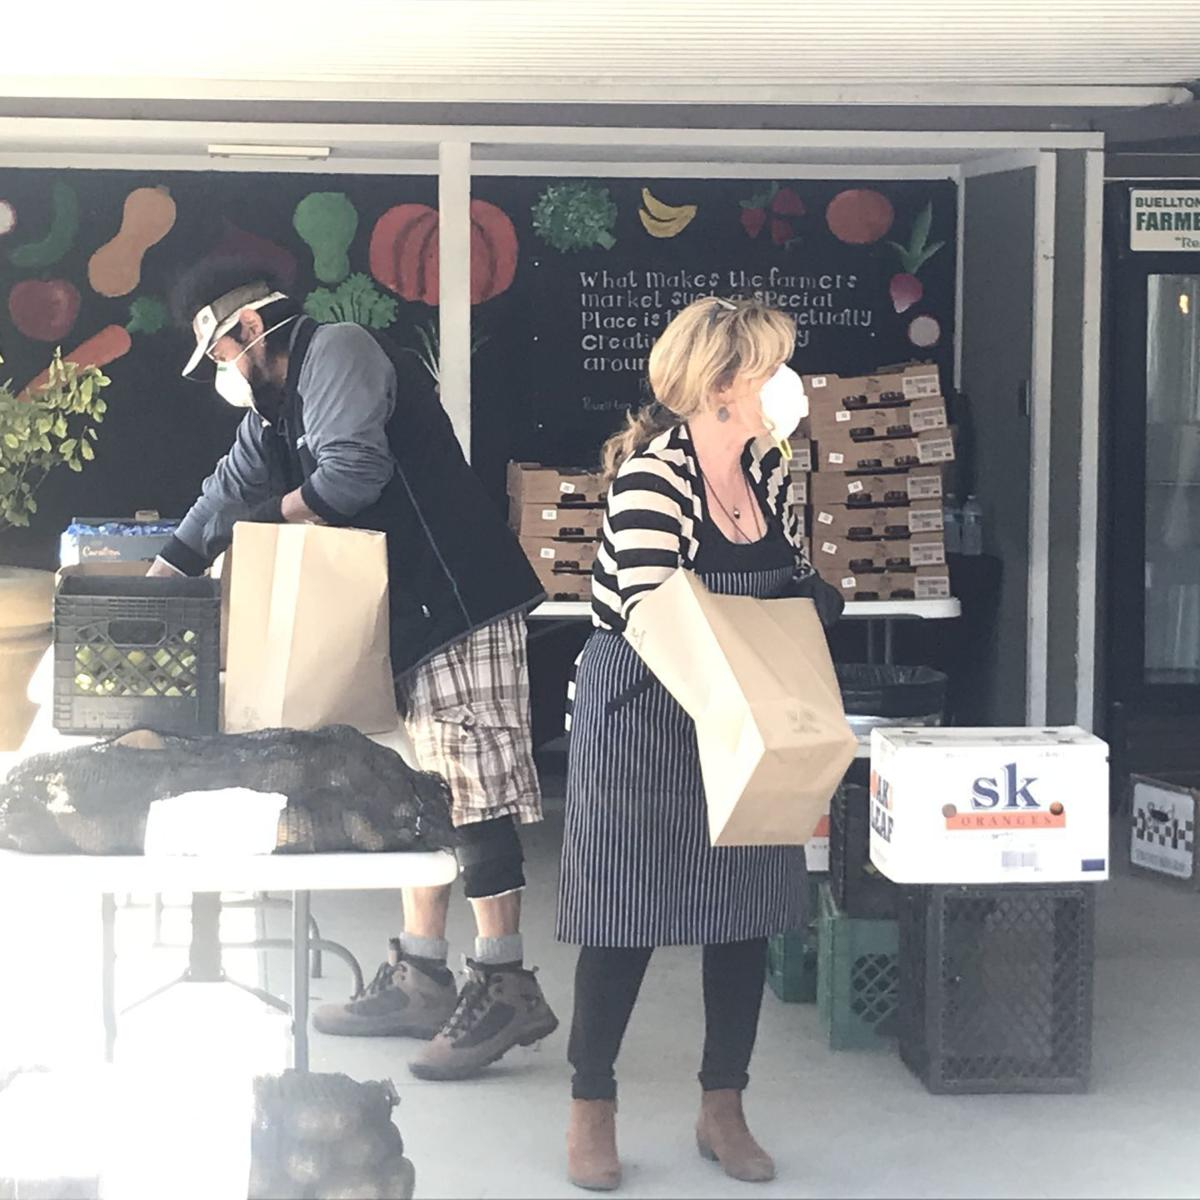 Photos: Buellton Senior Center increases food delivery to local seniors